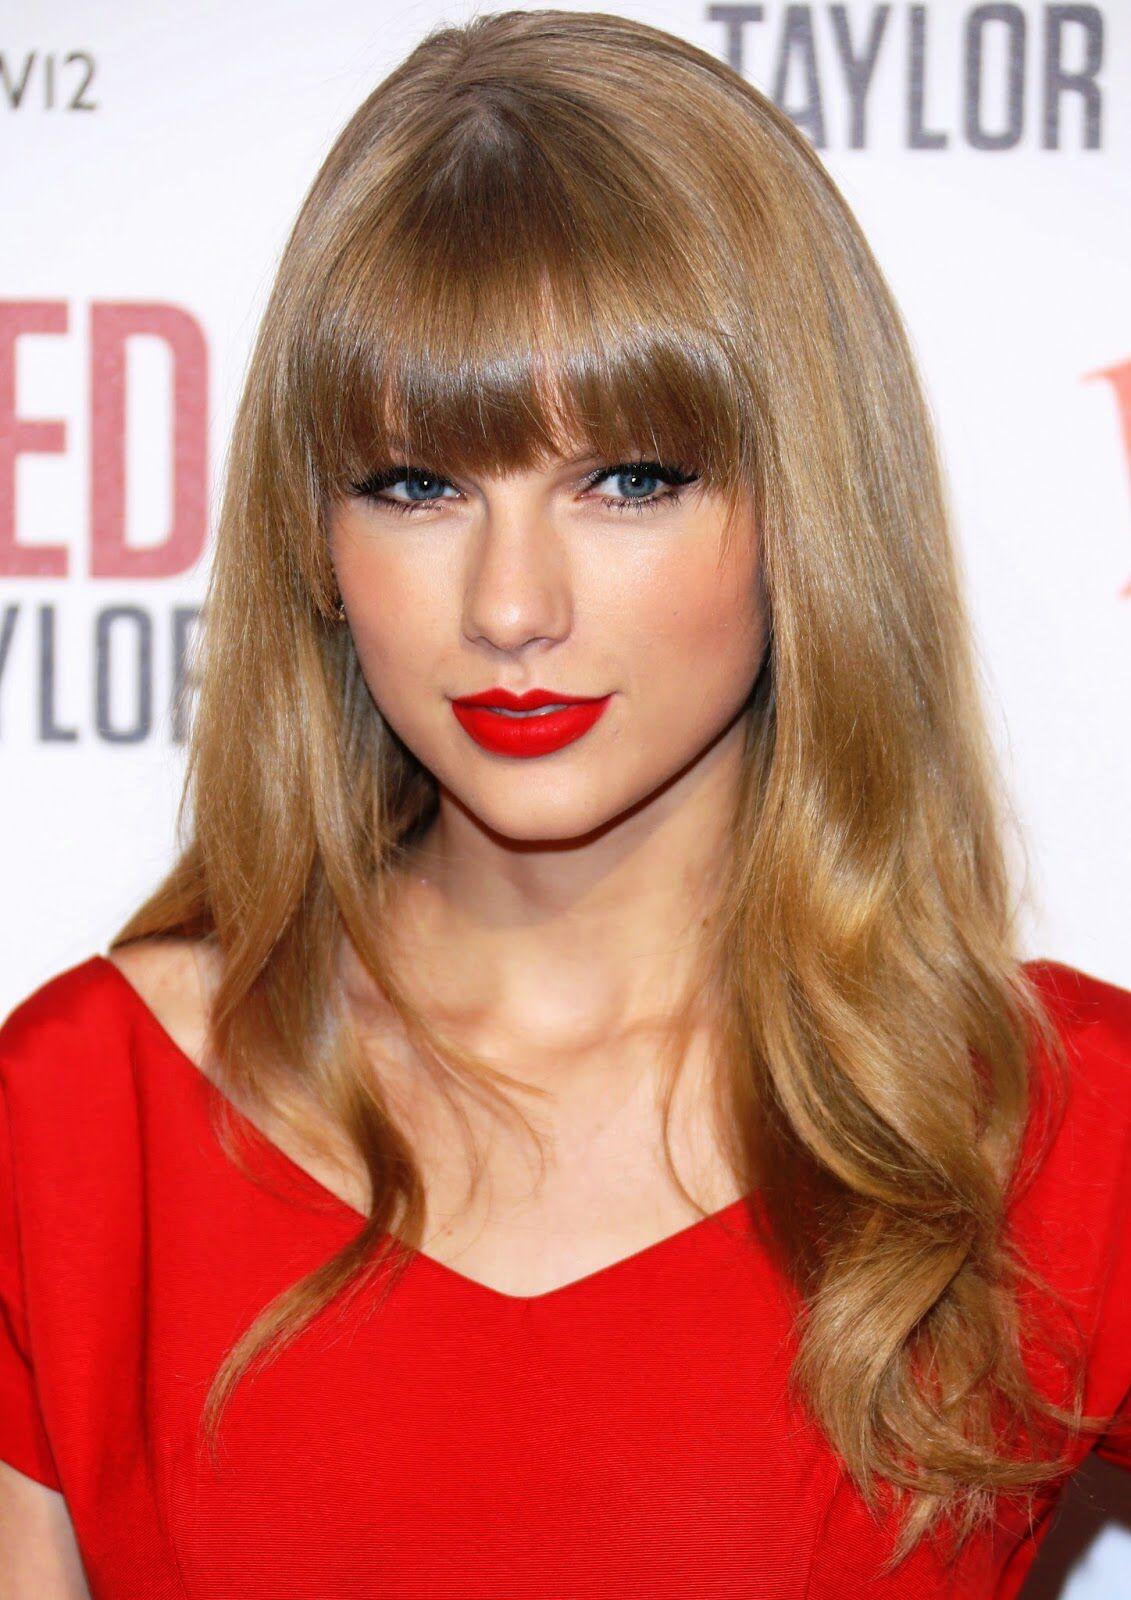 Malakhatem taylor swift pinterest hair blonde hair and